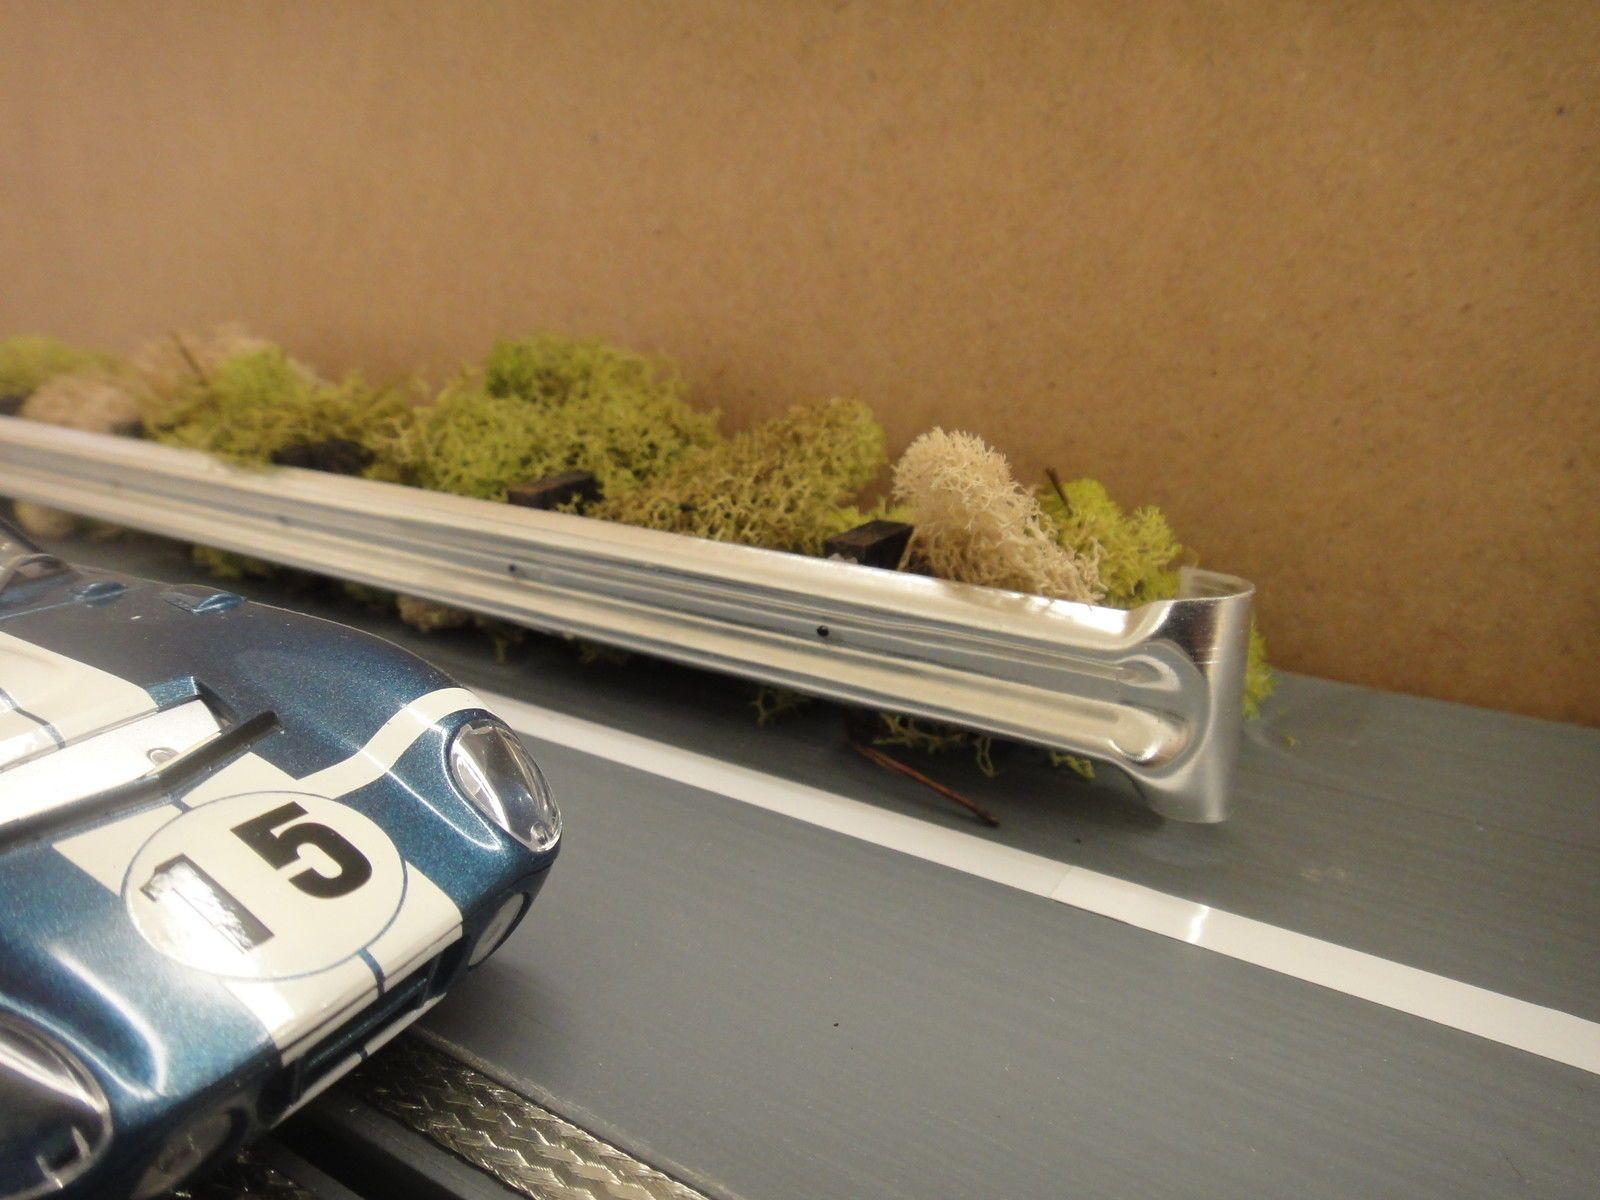 1 32 Scale Aluminum Armco Guardrail System Slot Car Track Diorama Scenery Ebay Slot Cars Slot Car Tracks Stuffed Pork Tenderloin